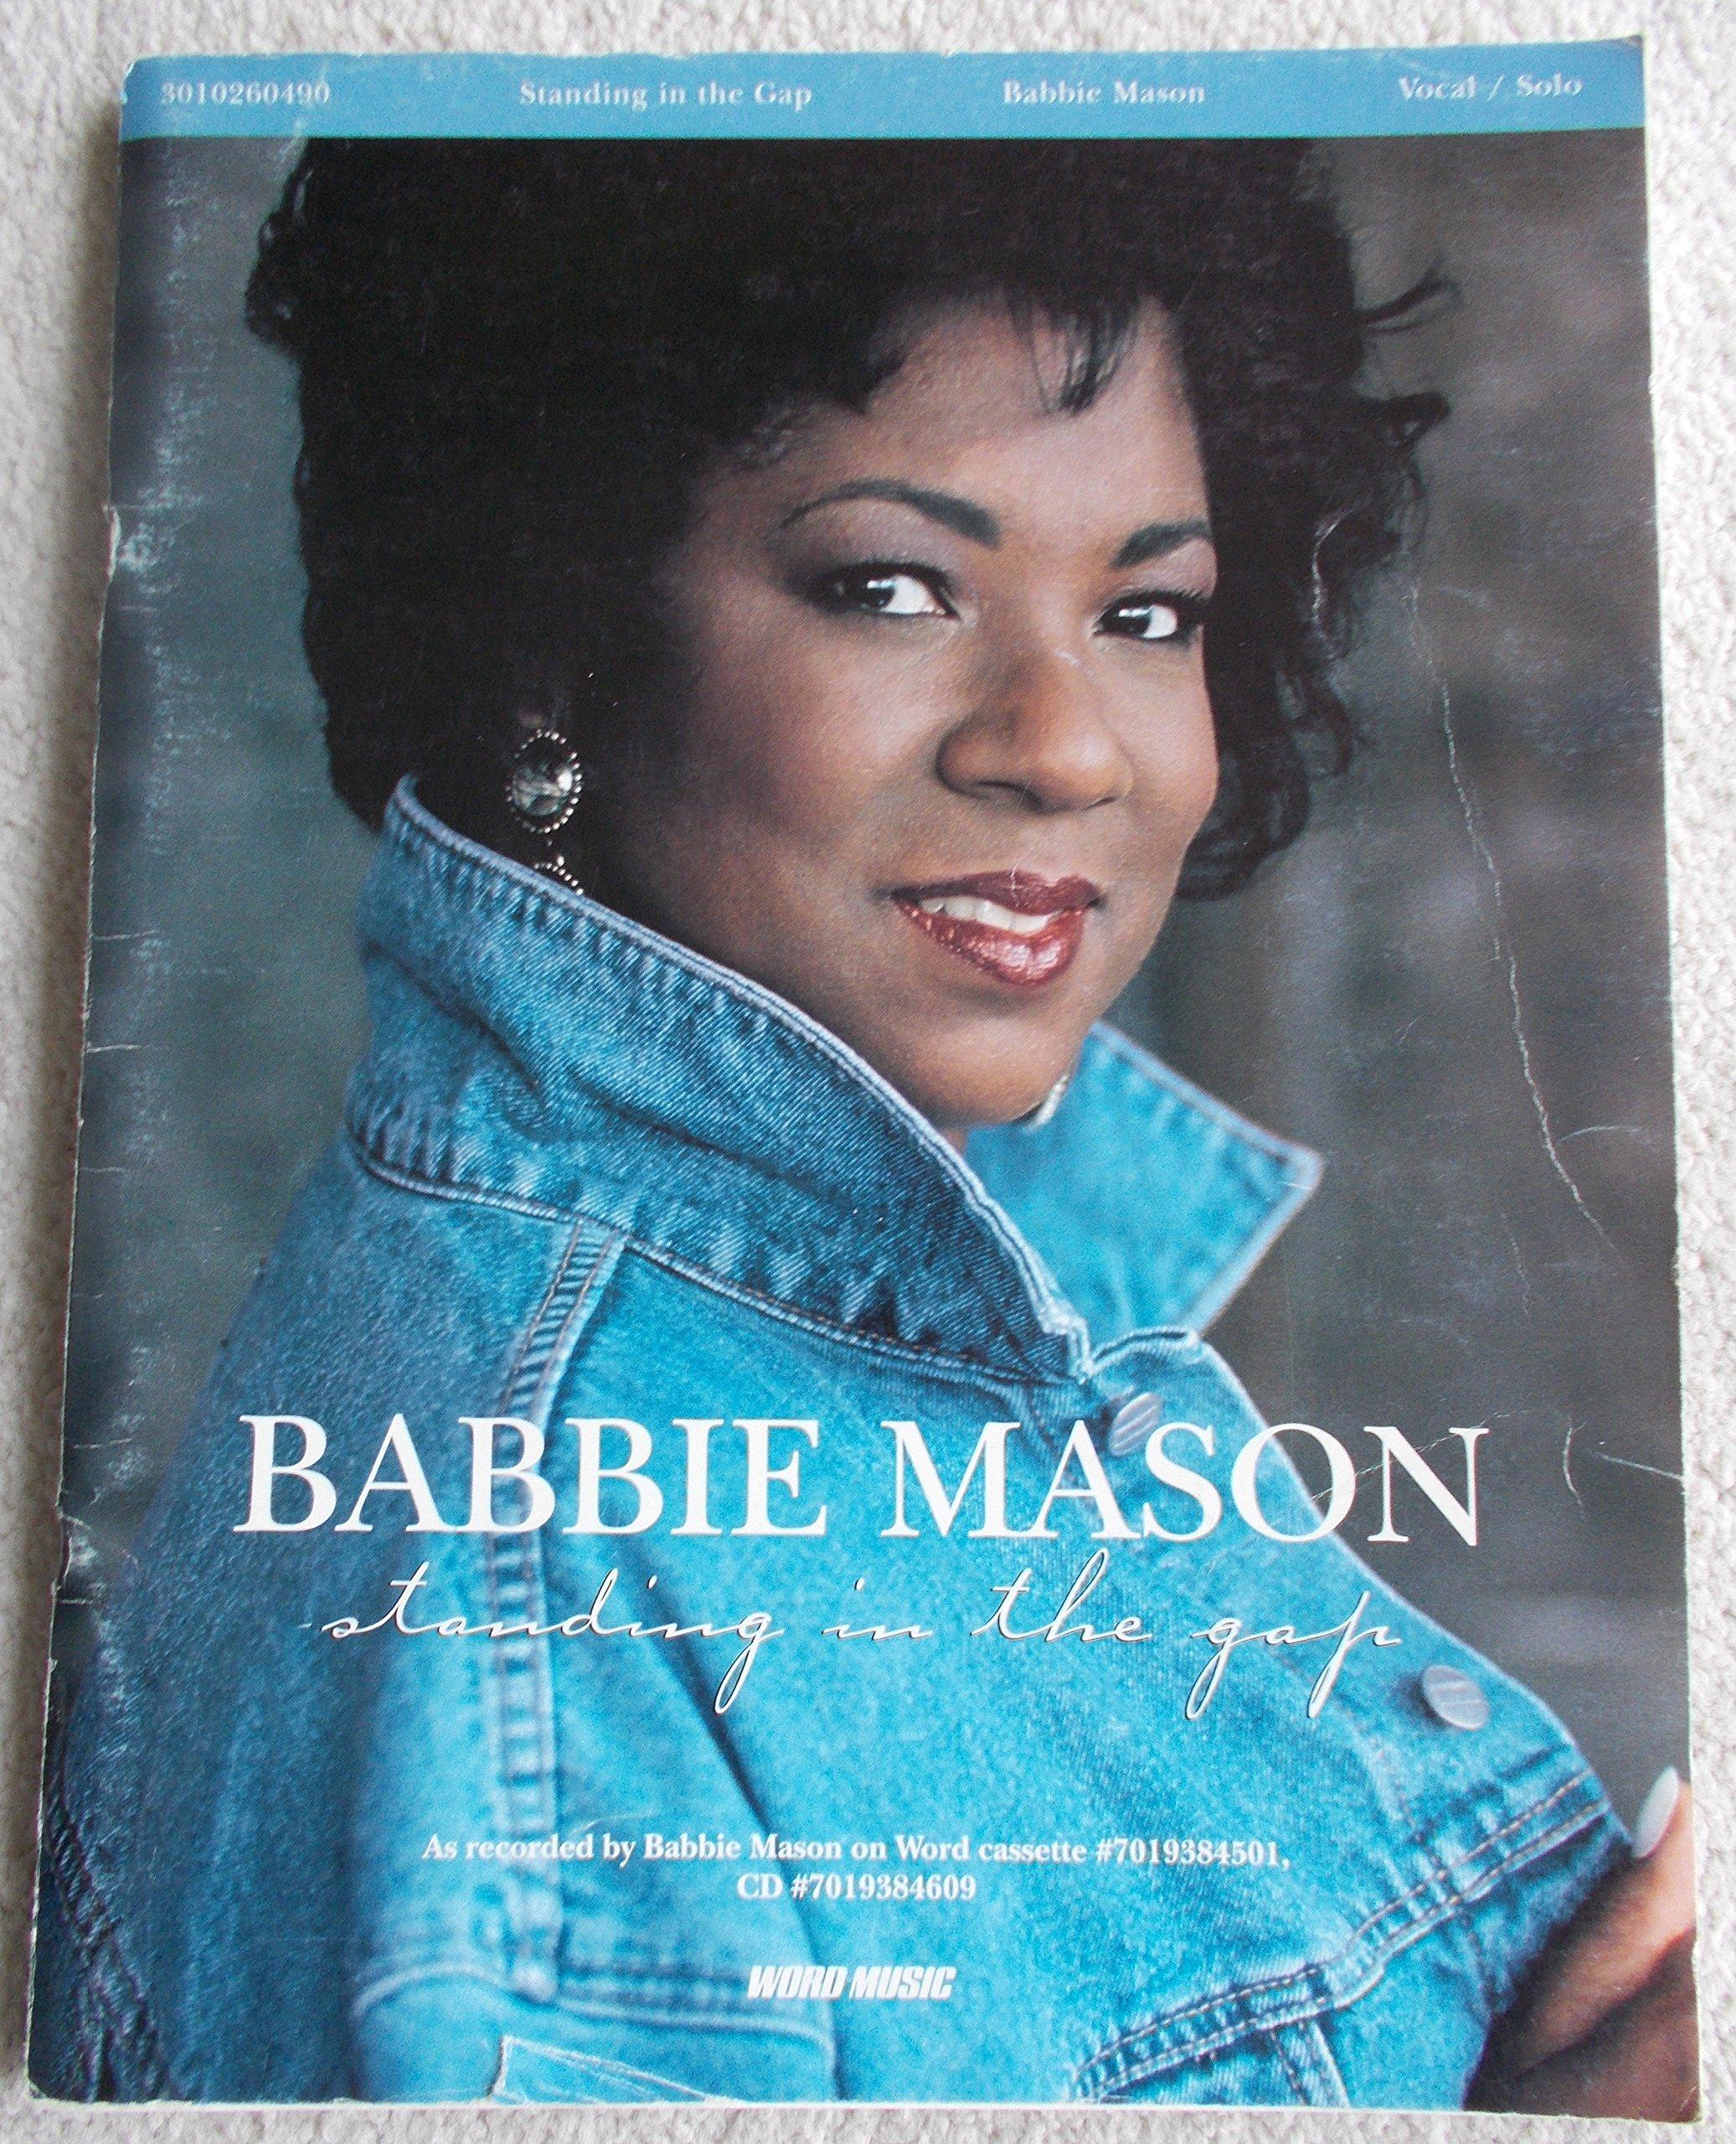 Babbie Mason   standing in the Gap Sheet Music: Bryce Inman